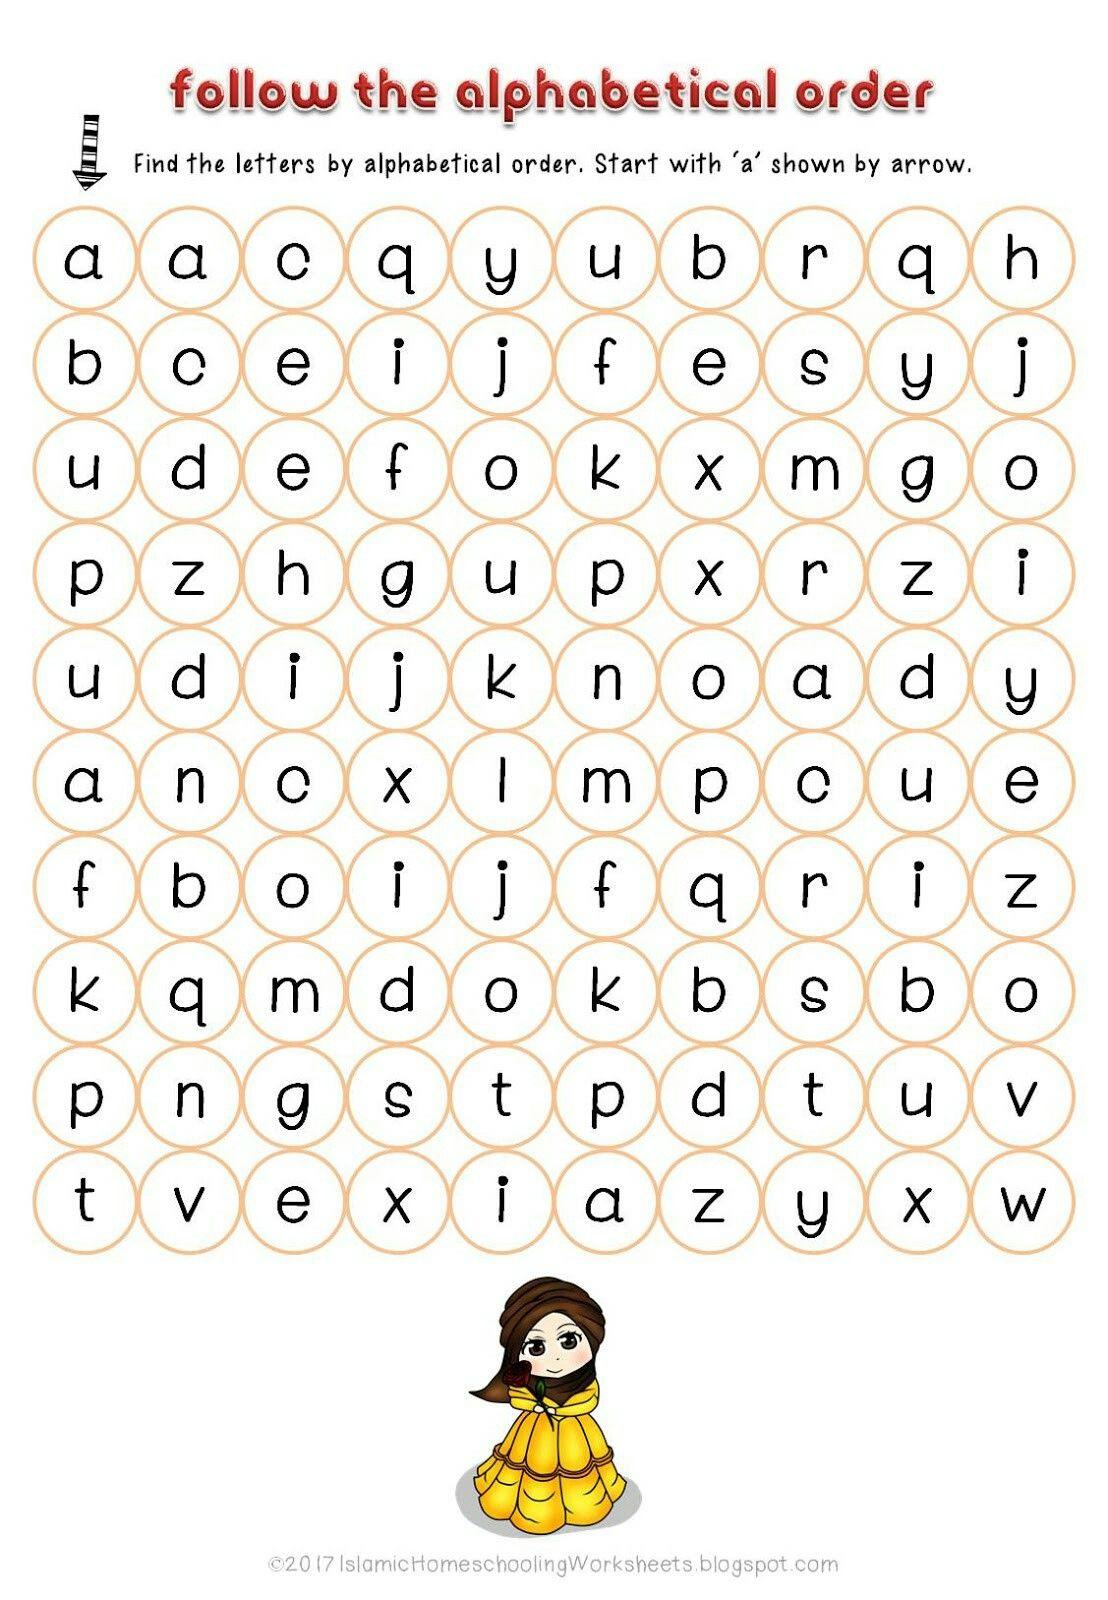 Follow The Alphabetical Order In Free Disney Princess Preschool Pack Islamic Version